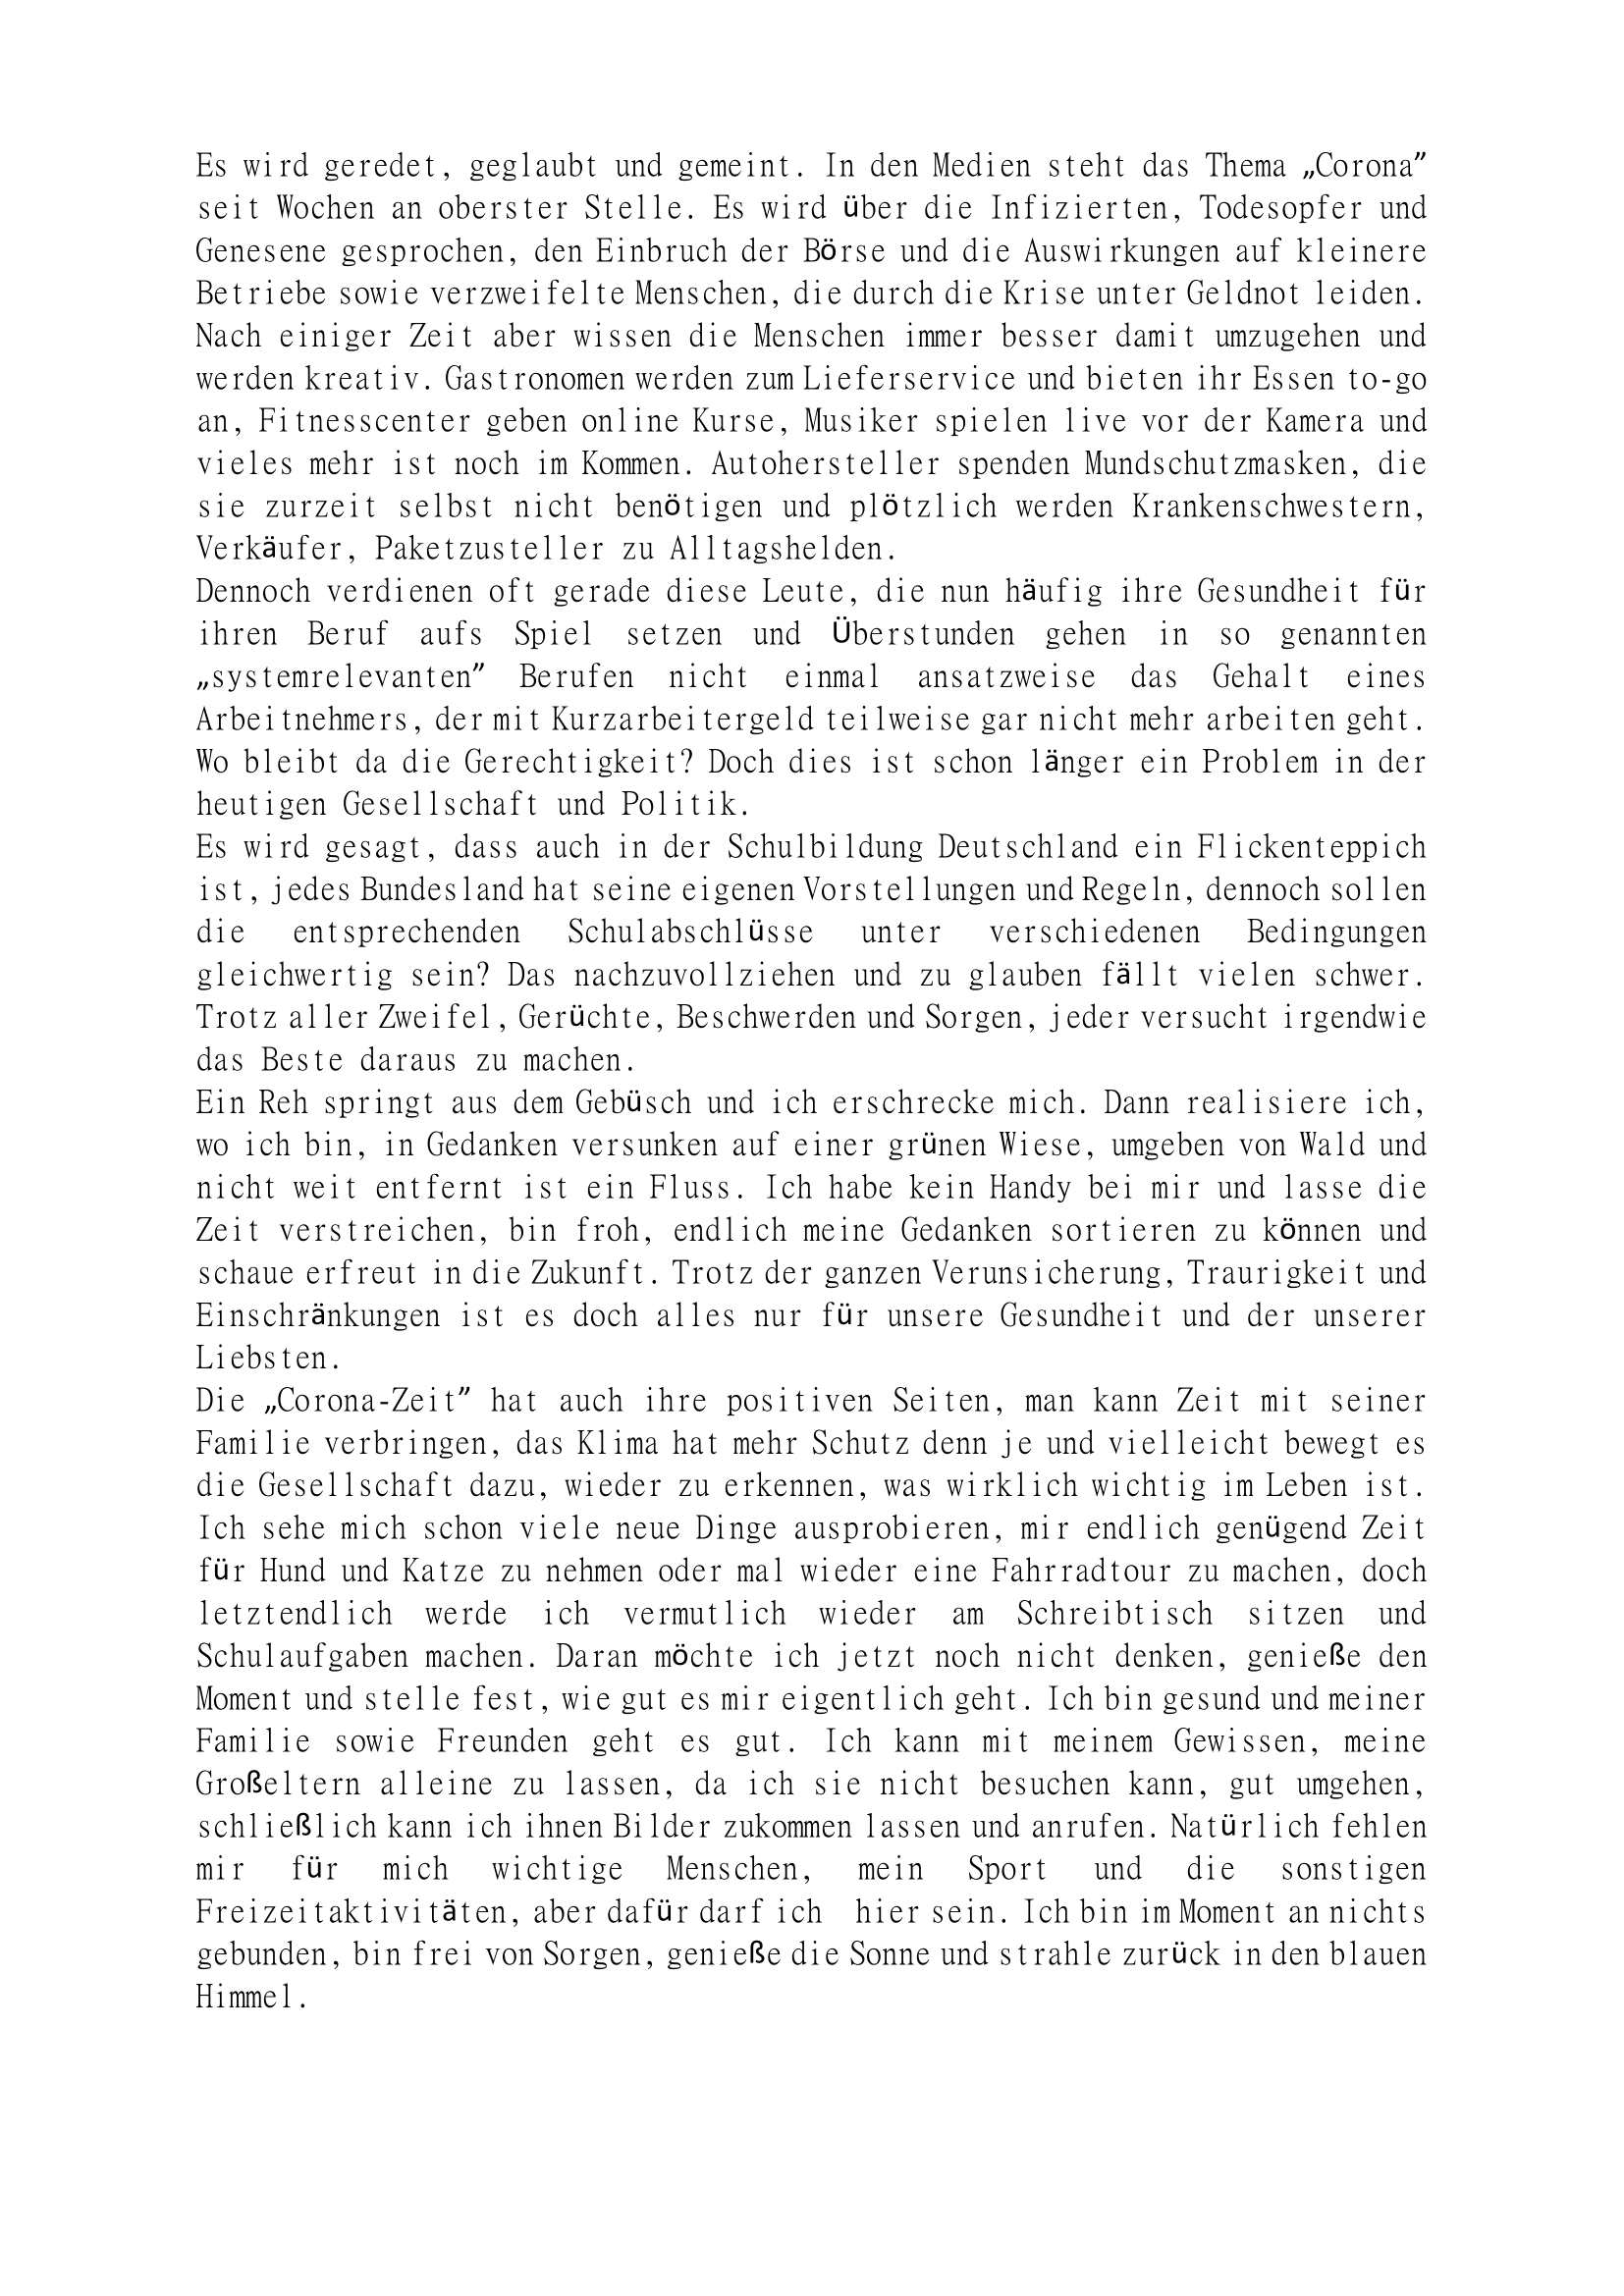 Gedankenwirbel (Teil 2)